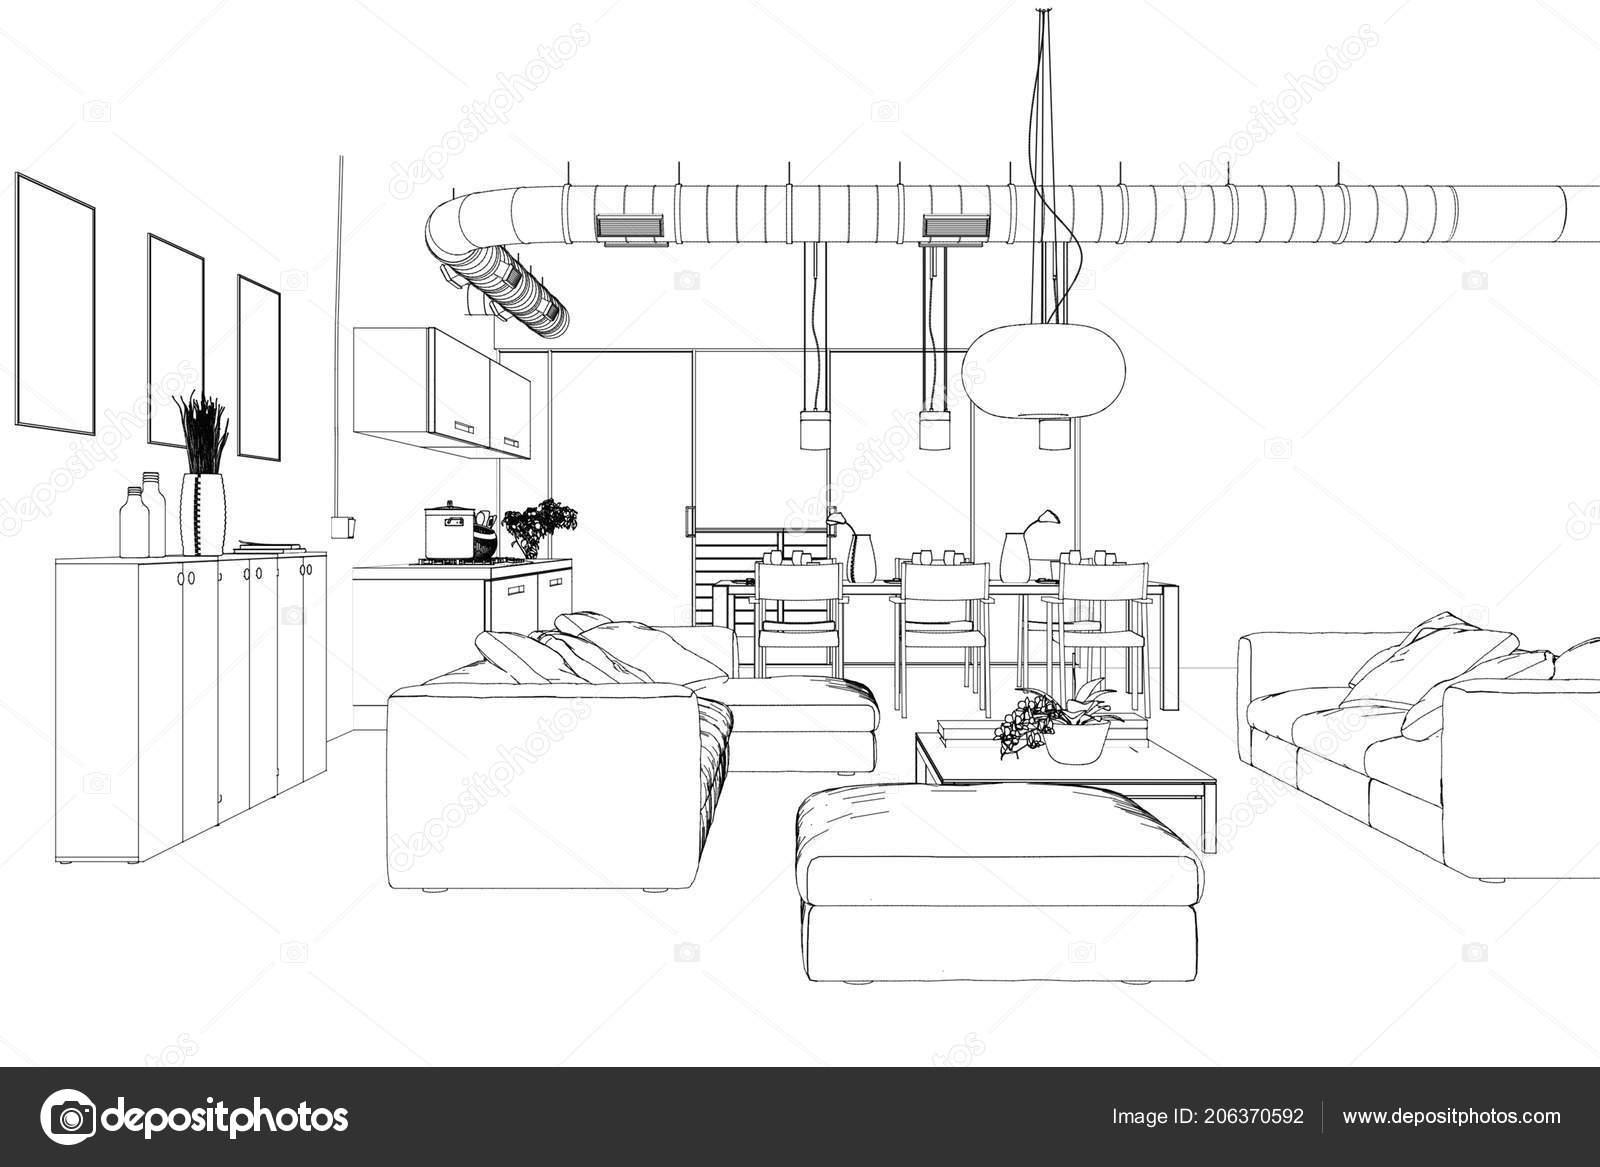 Interior Design Living Room custom Drawing — Stock Photo ... on interior design board layout, interior design plan view, interior design flowchart, interior design block diagram,